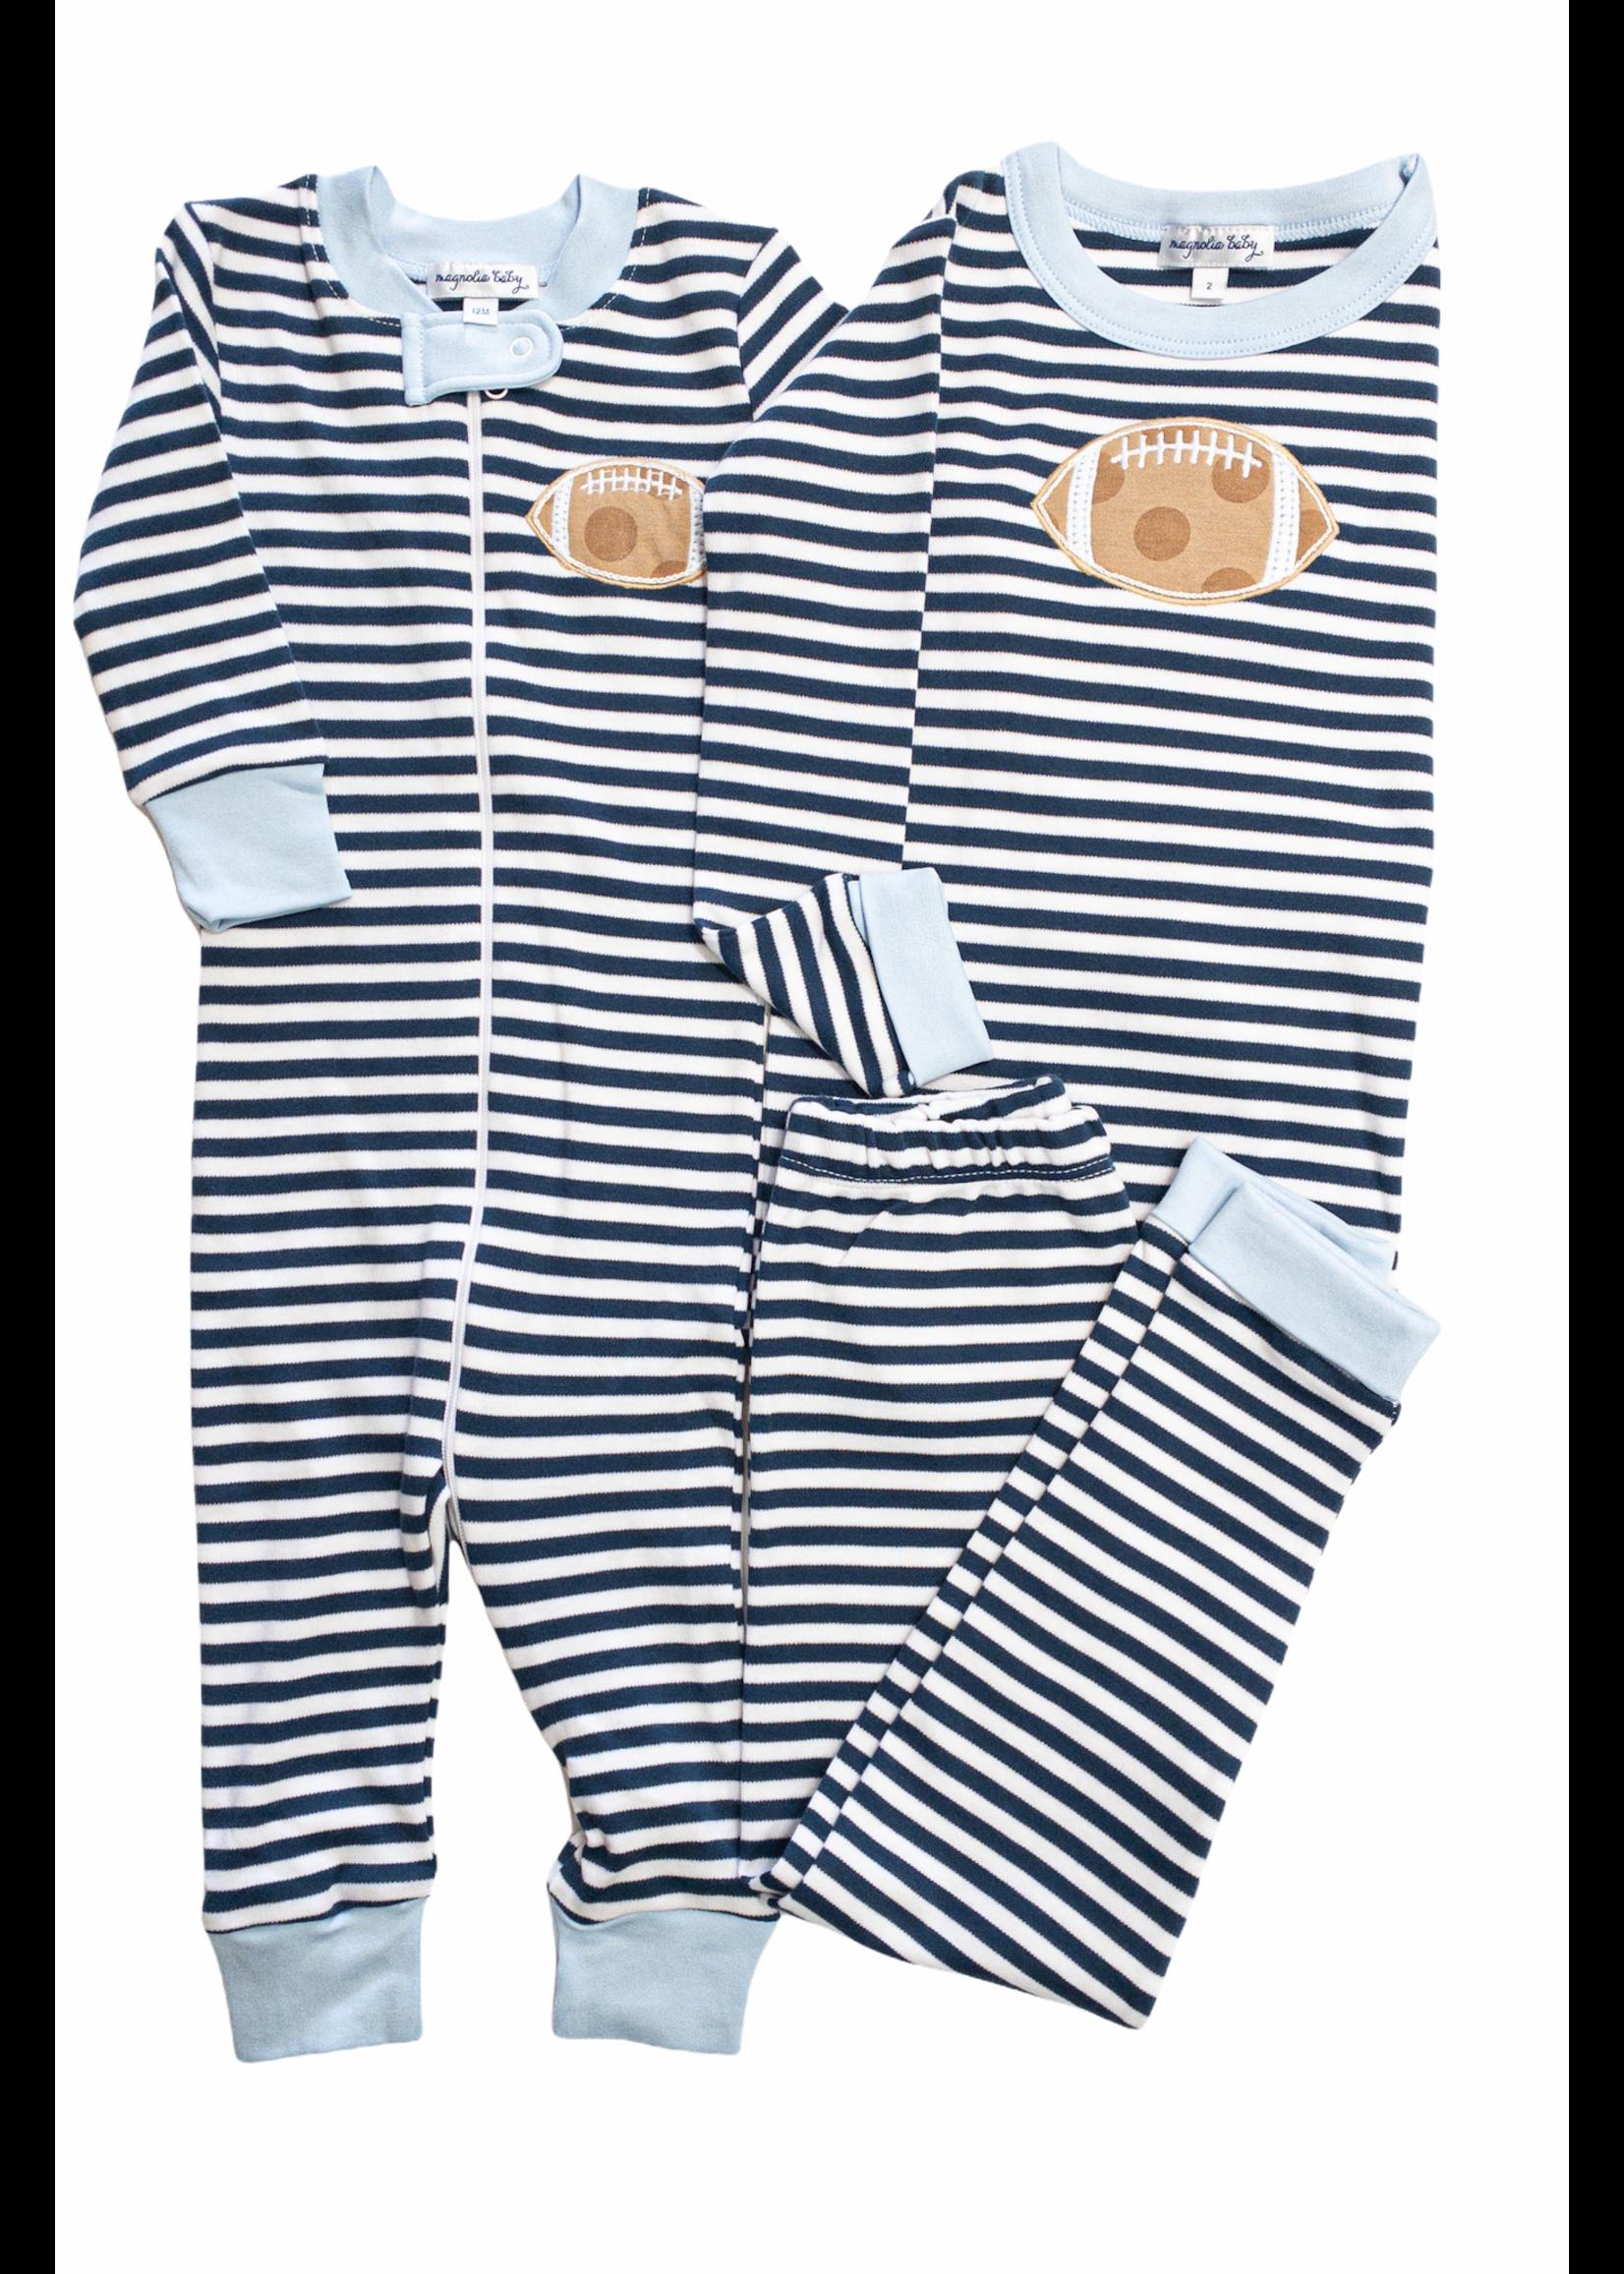 Magnolia Baby Football Stripes Long PJ's